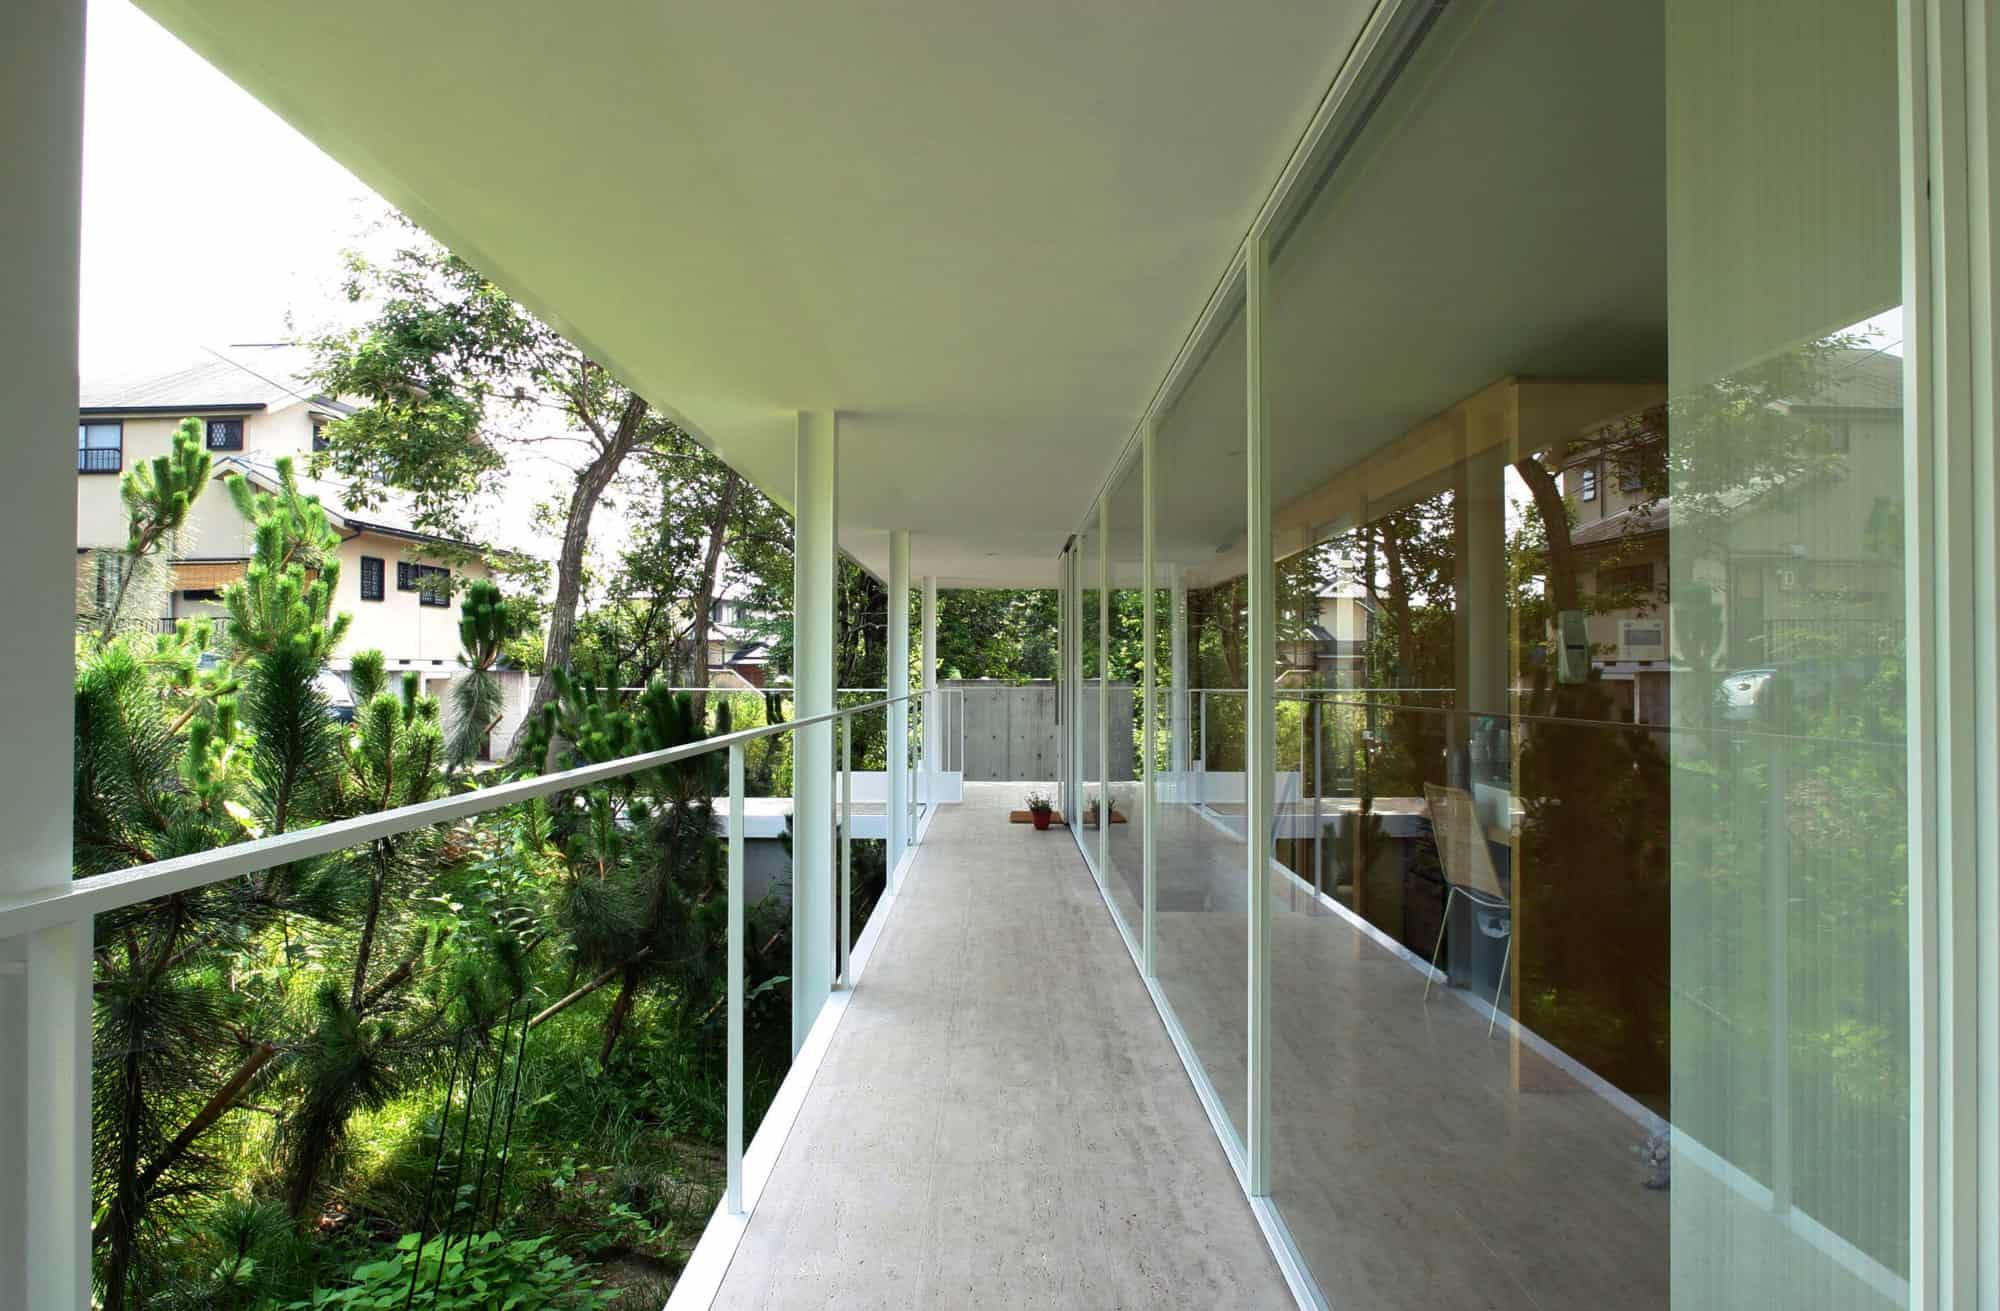 Suishouen House by Tomoaki Uno Architects (4)